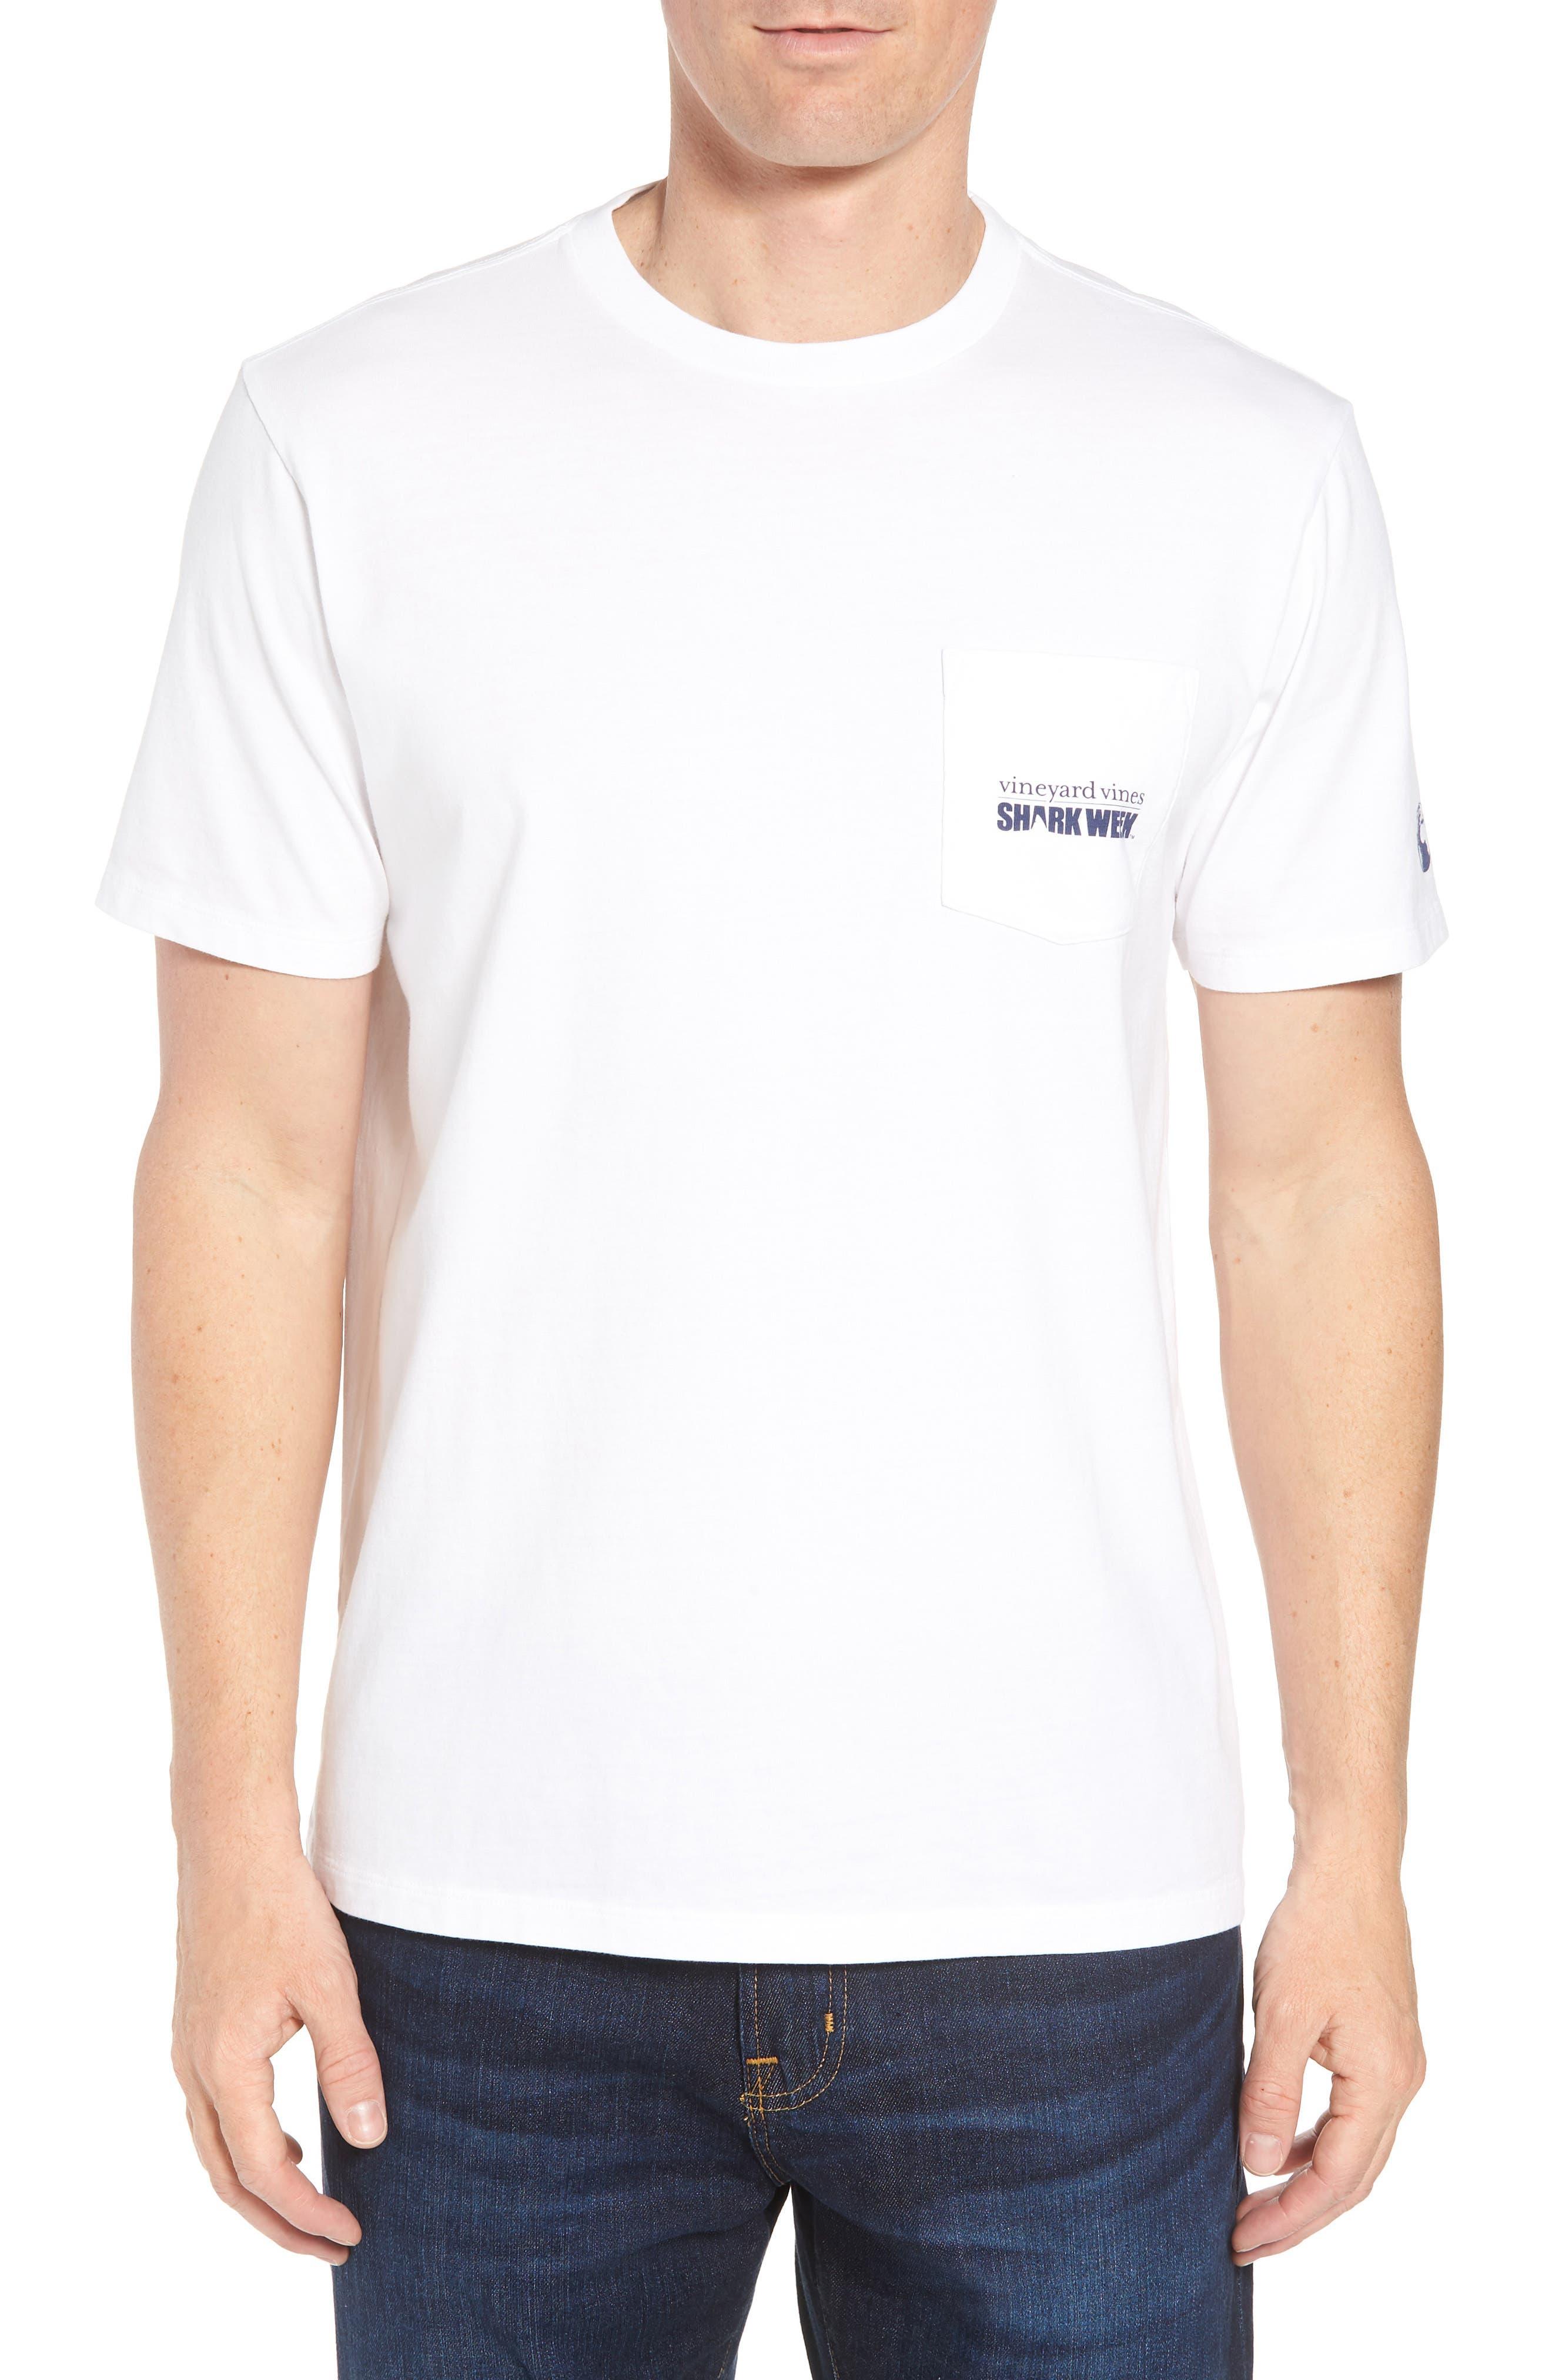 x Shark Week<sup>™</sup> Logo Pocket T-Shirt,                         Main,                         color, White Cap